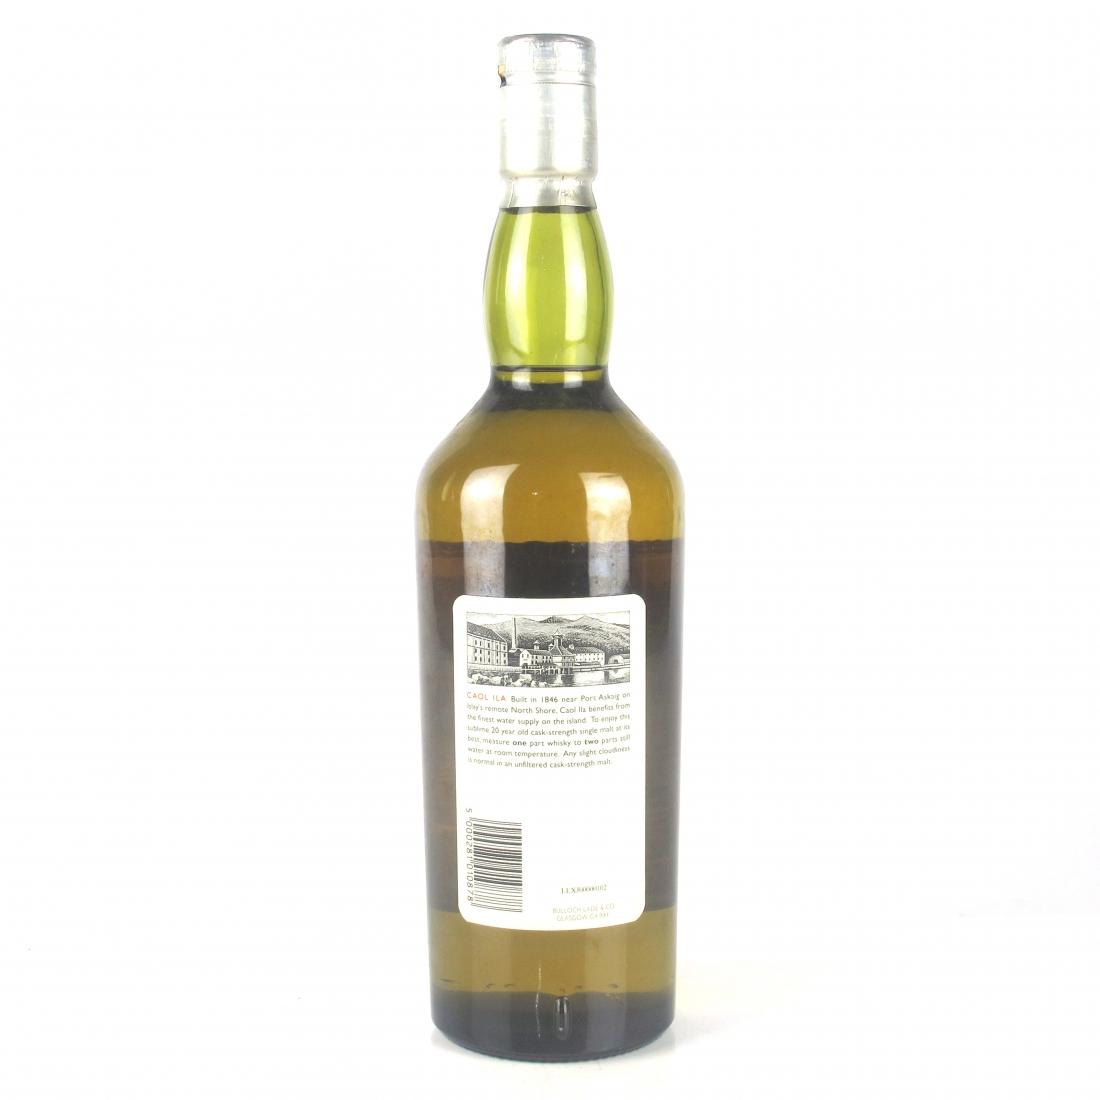 Caol Ila 1975 Rare Malt 20 Year Old 75cl / 61.18%